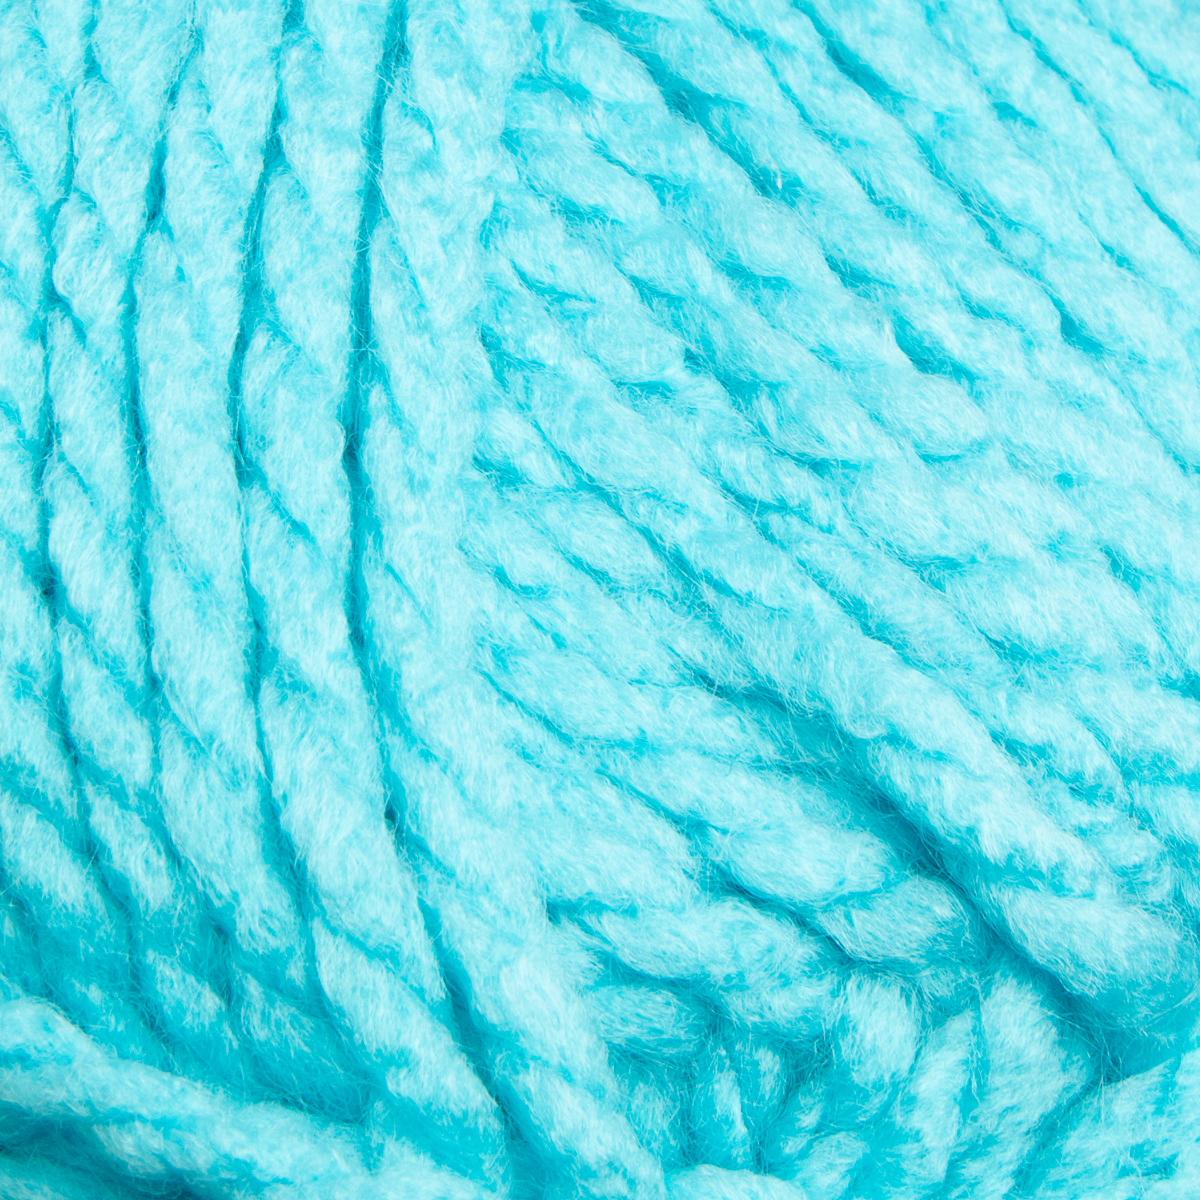 3pk-Premier-Yarns-Deborah-Norville-Serenity-100-Acrylic-Yarn-Chunky-5-Knitting thumbnail 25